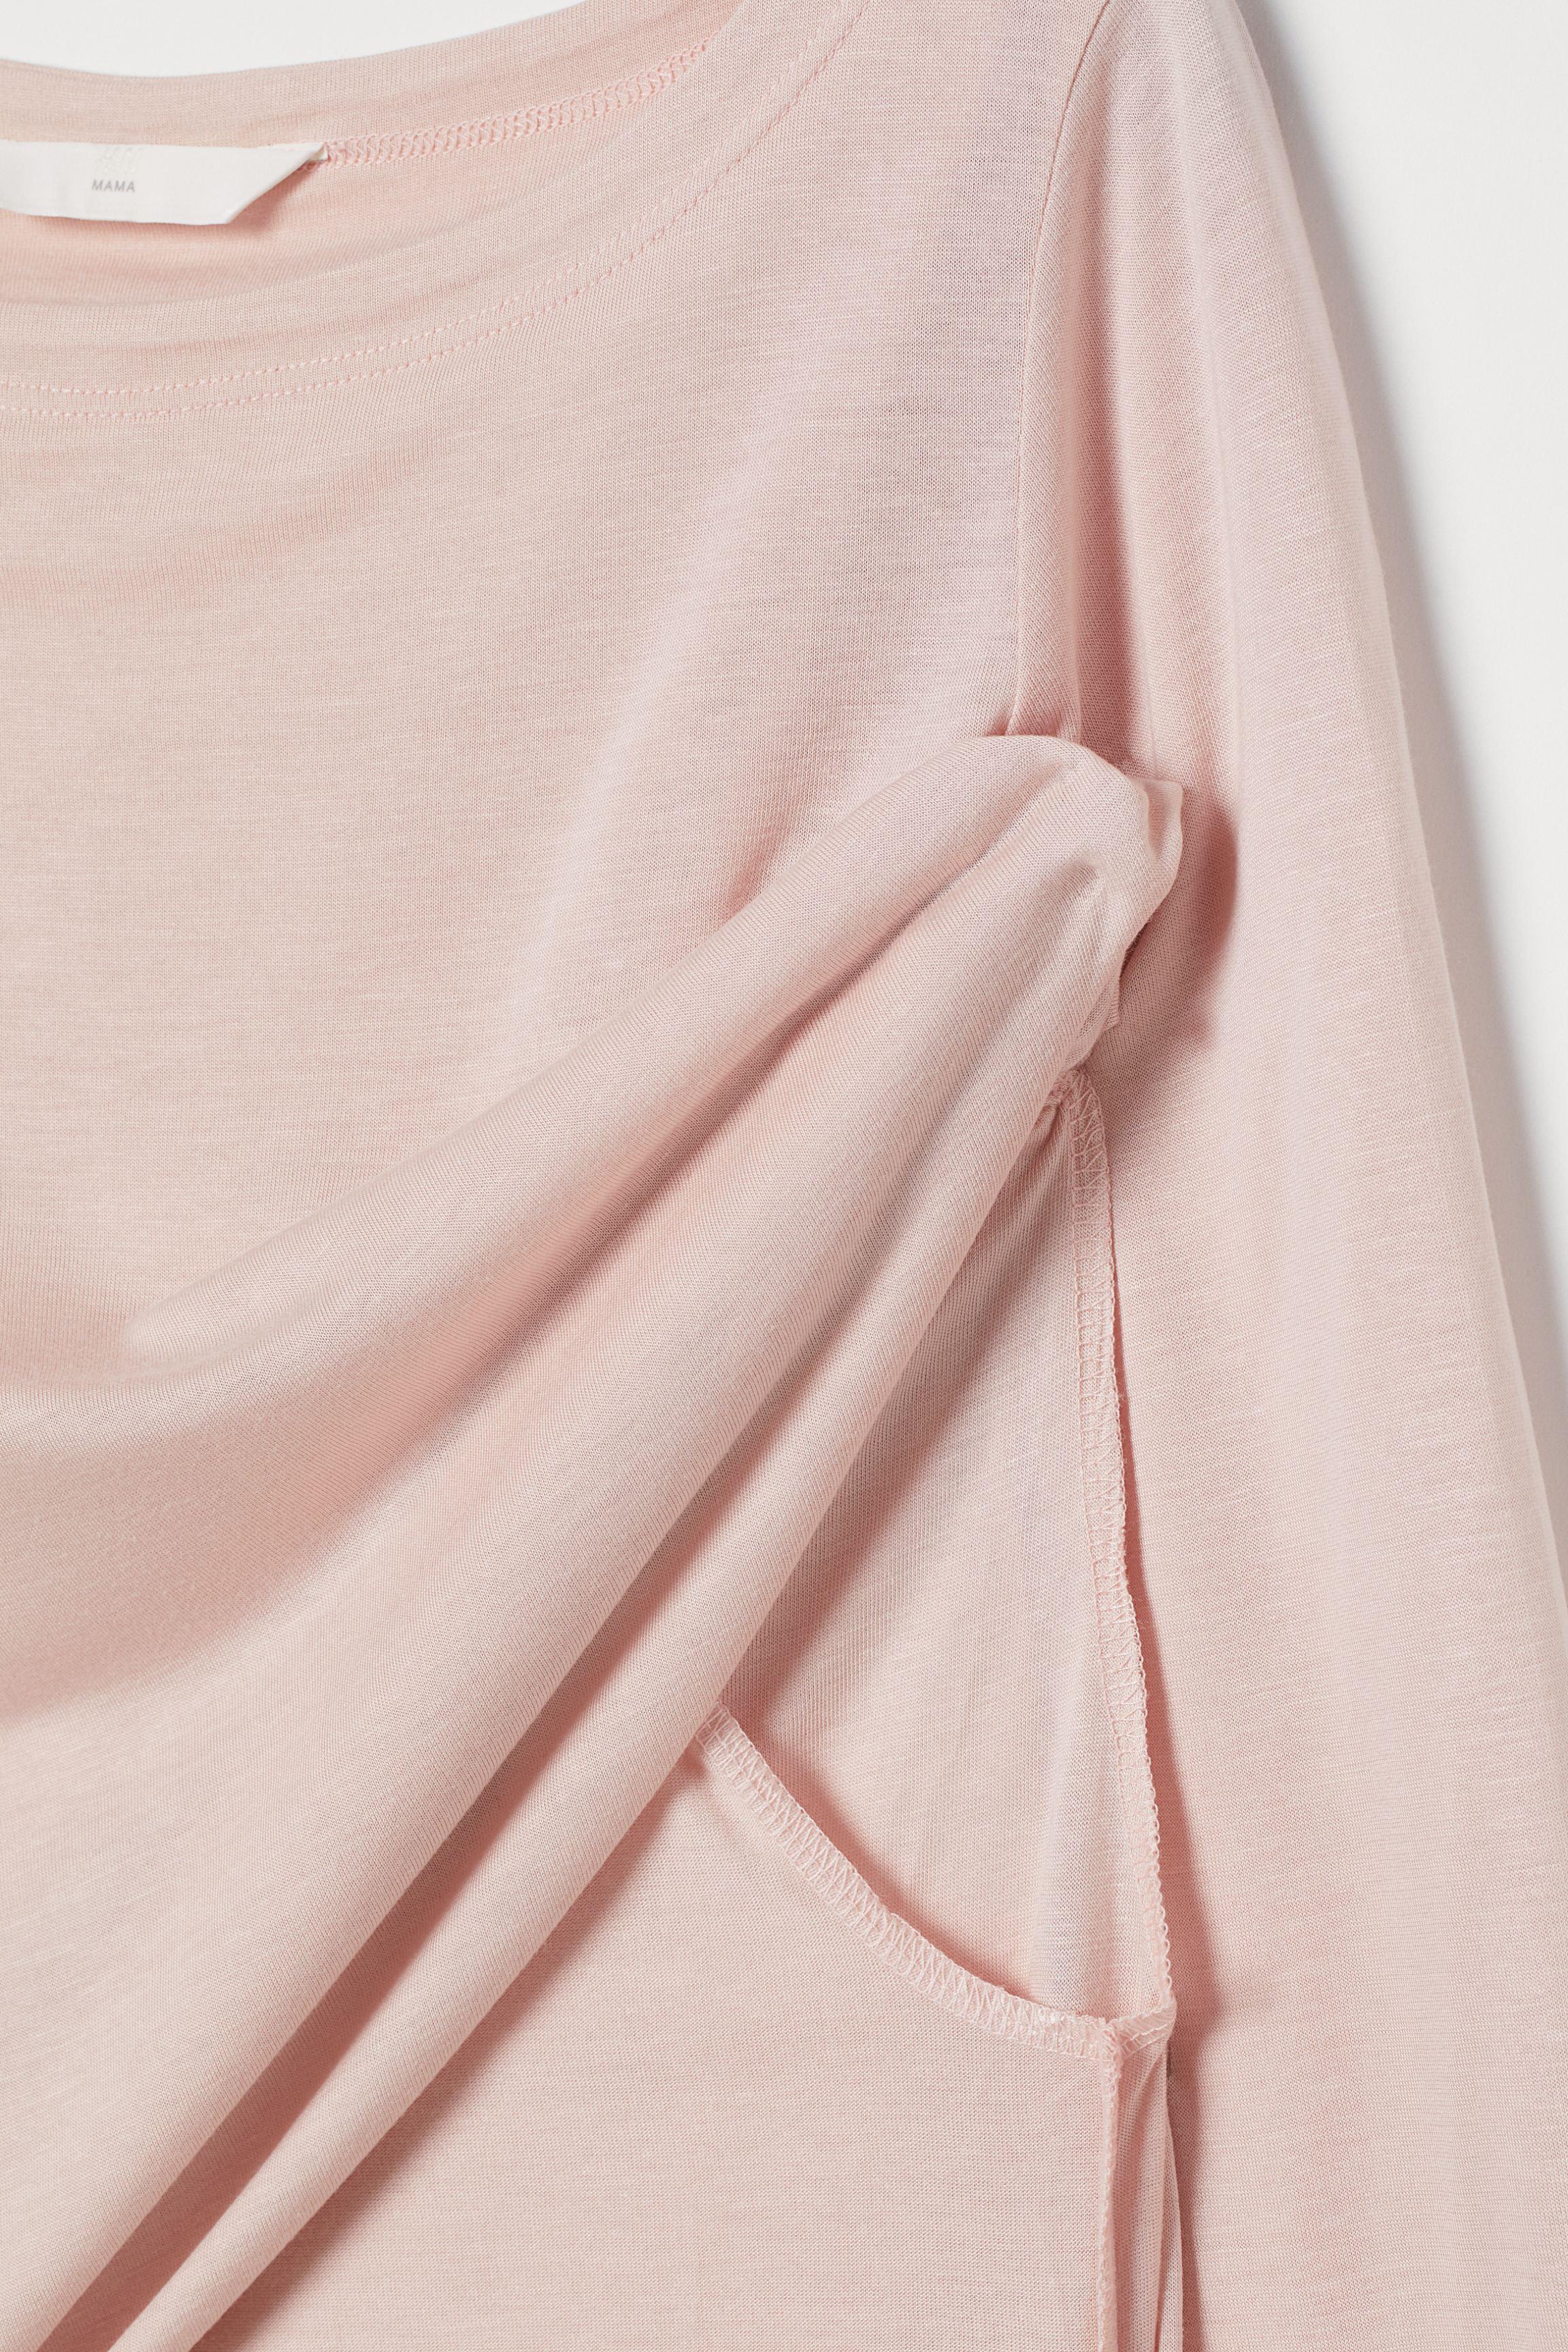 MAMA Long-sleeved Nursing Top